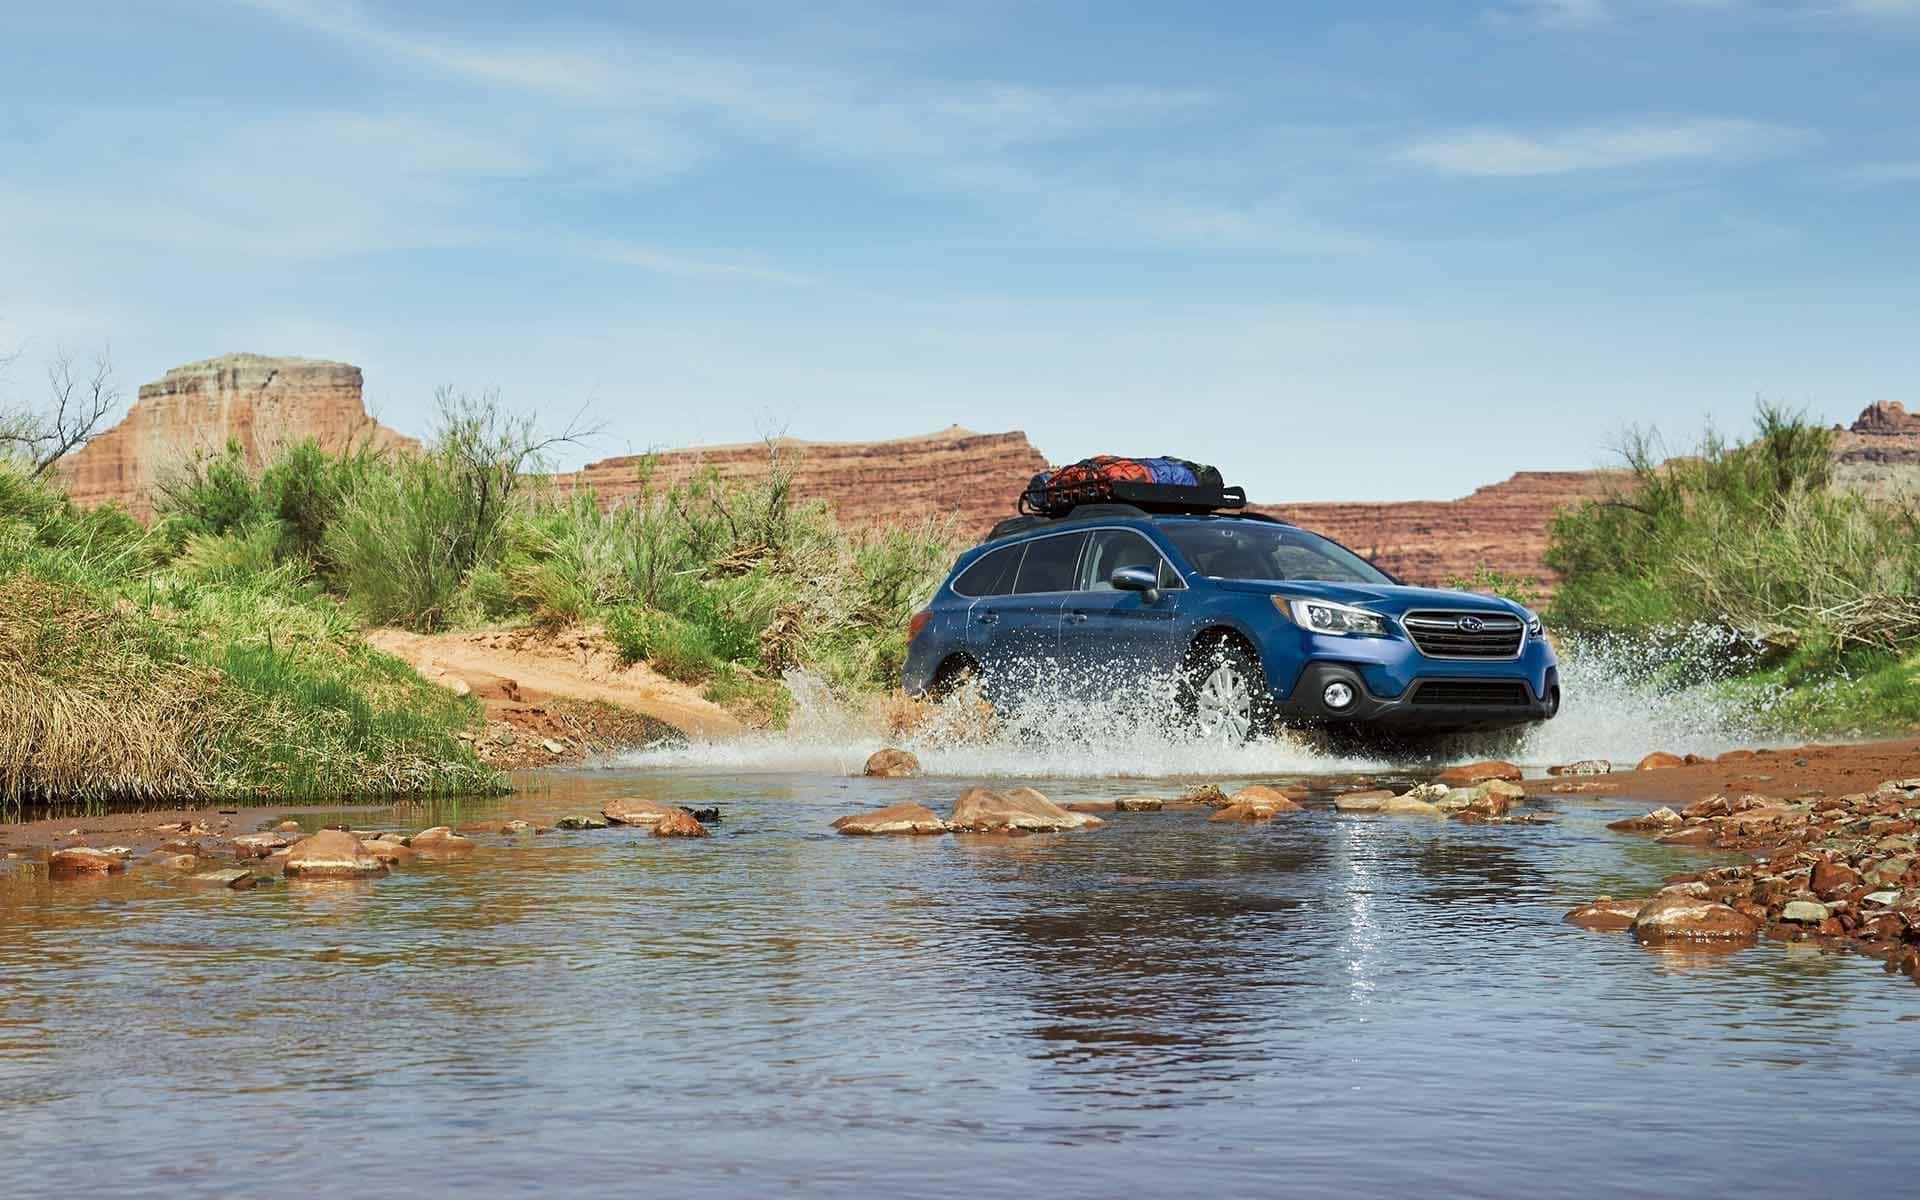 2019 Subaru Outback traversing river